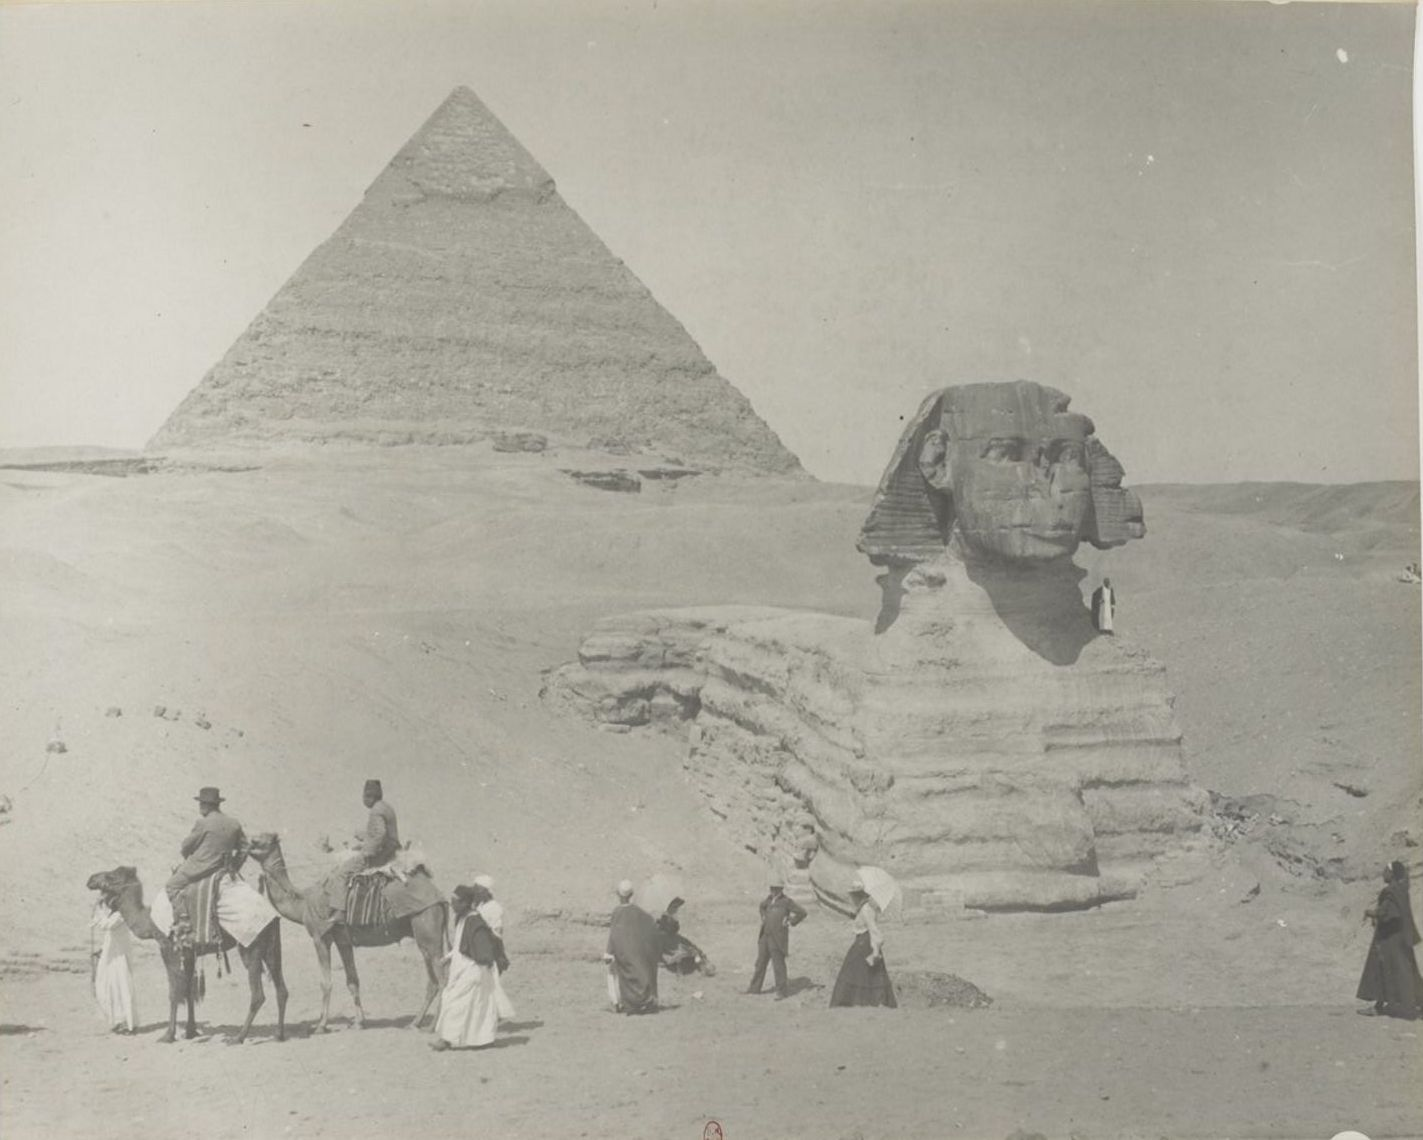 Гиза. Сфинкс и пирамиды. 1900-е